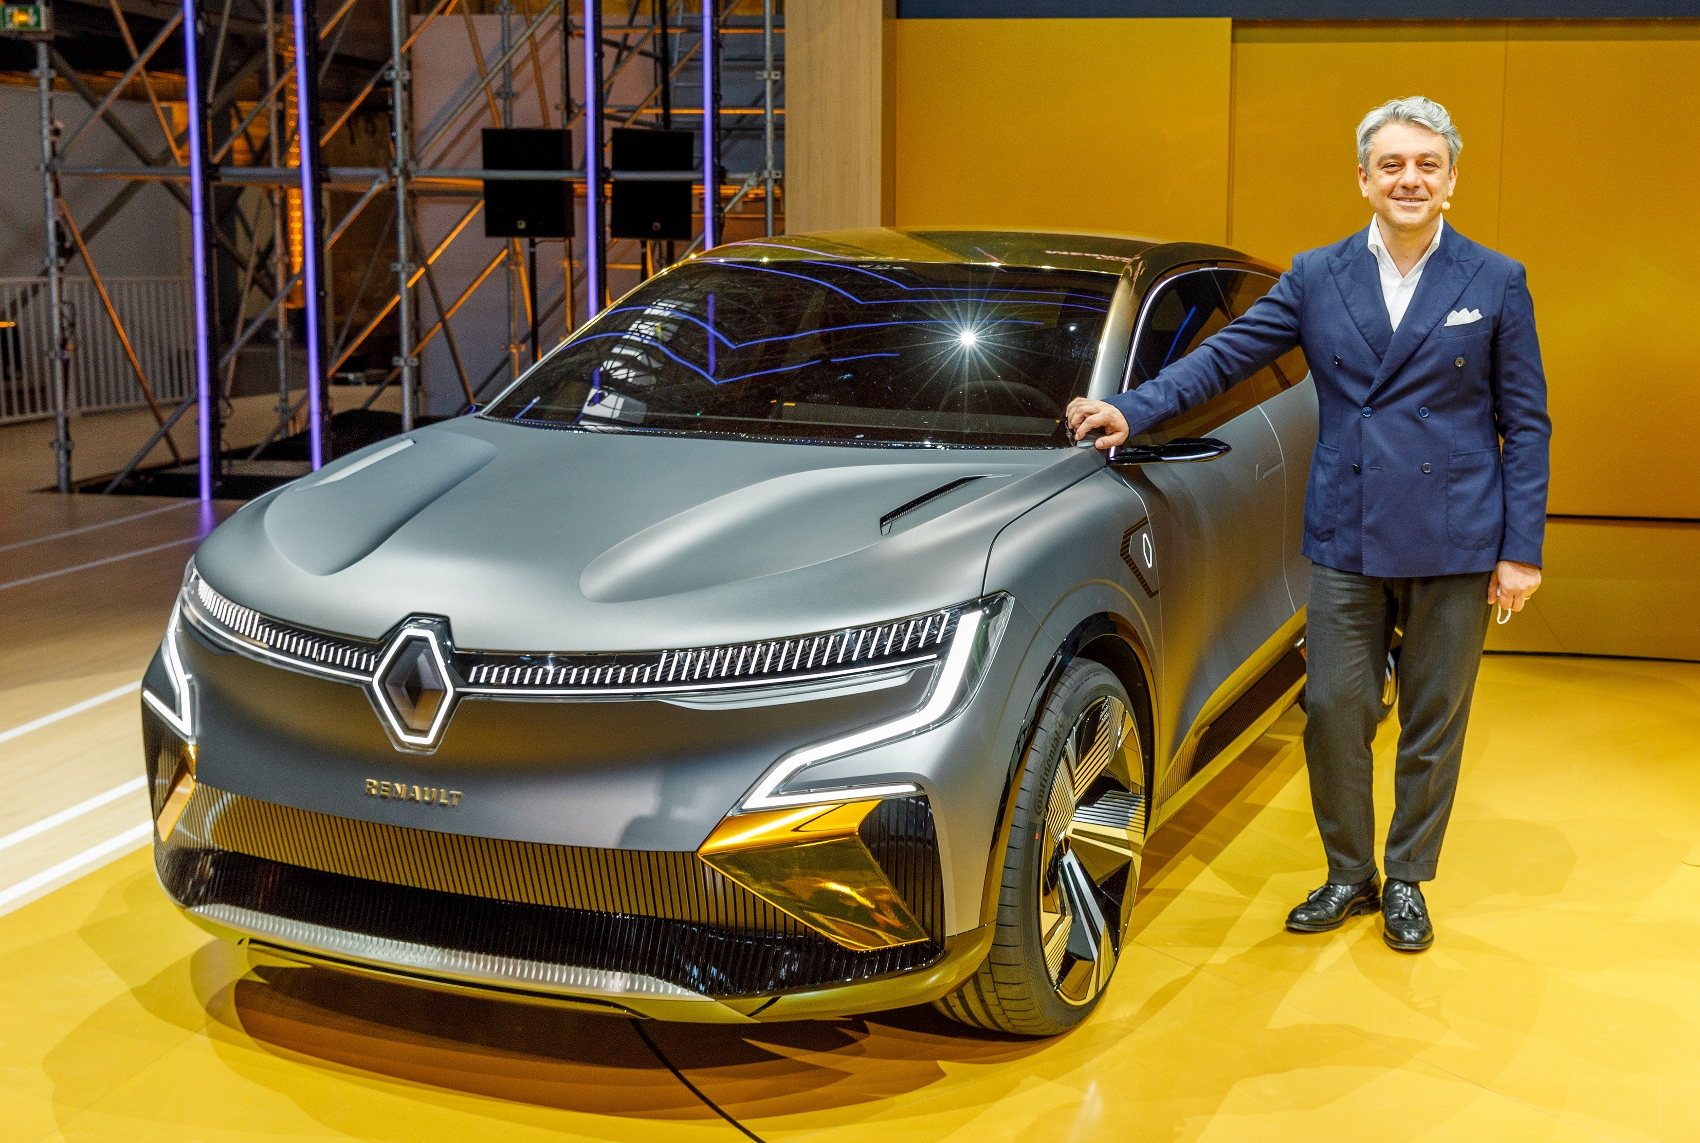 2020 - Renault eWays press conference (9) (1700x1143)